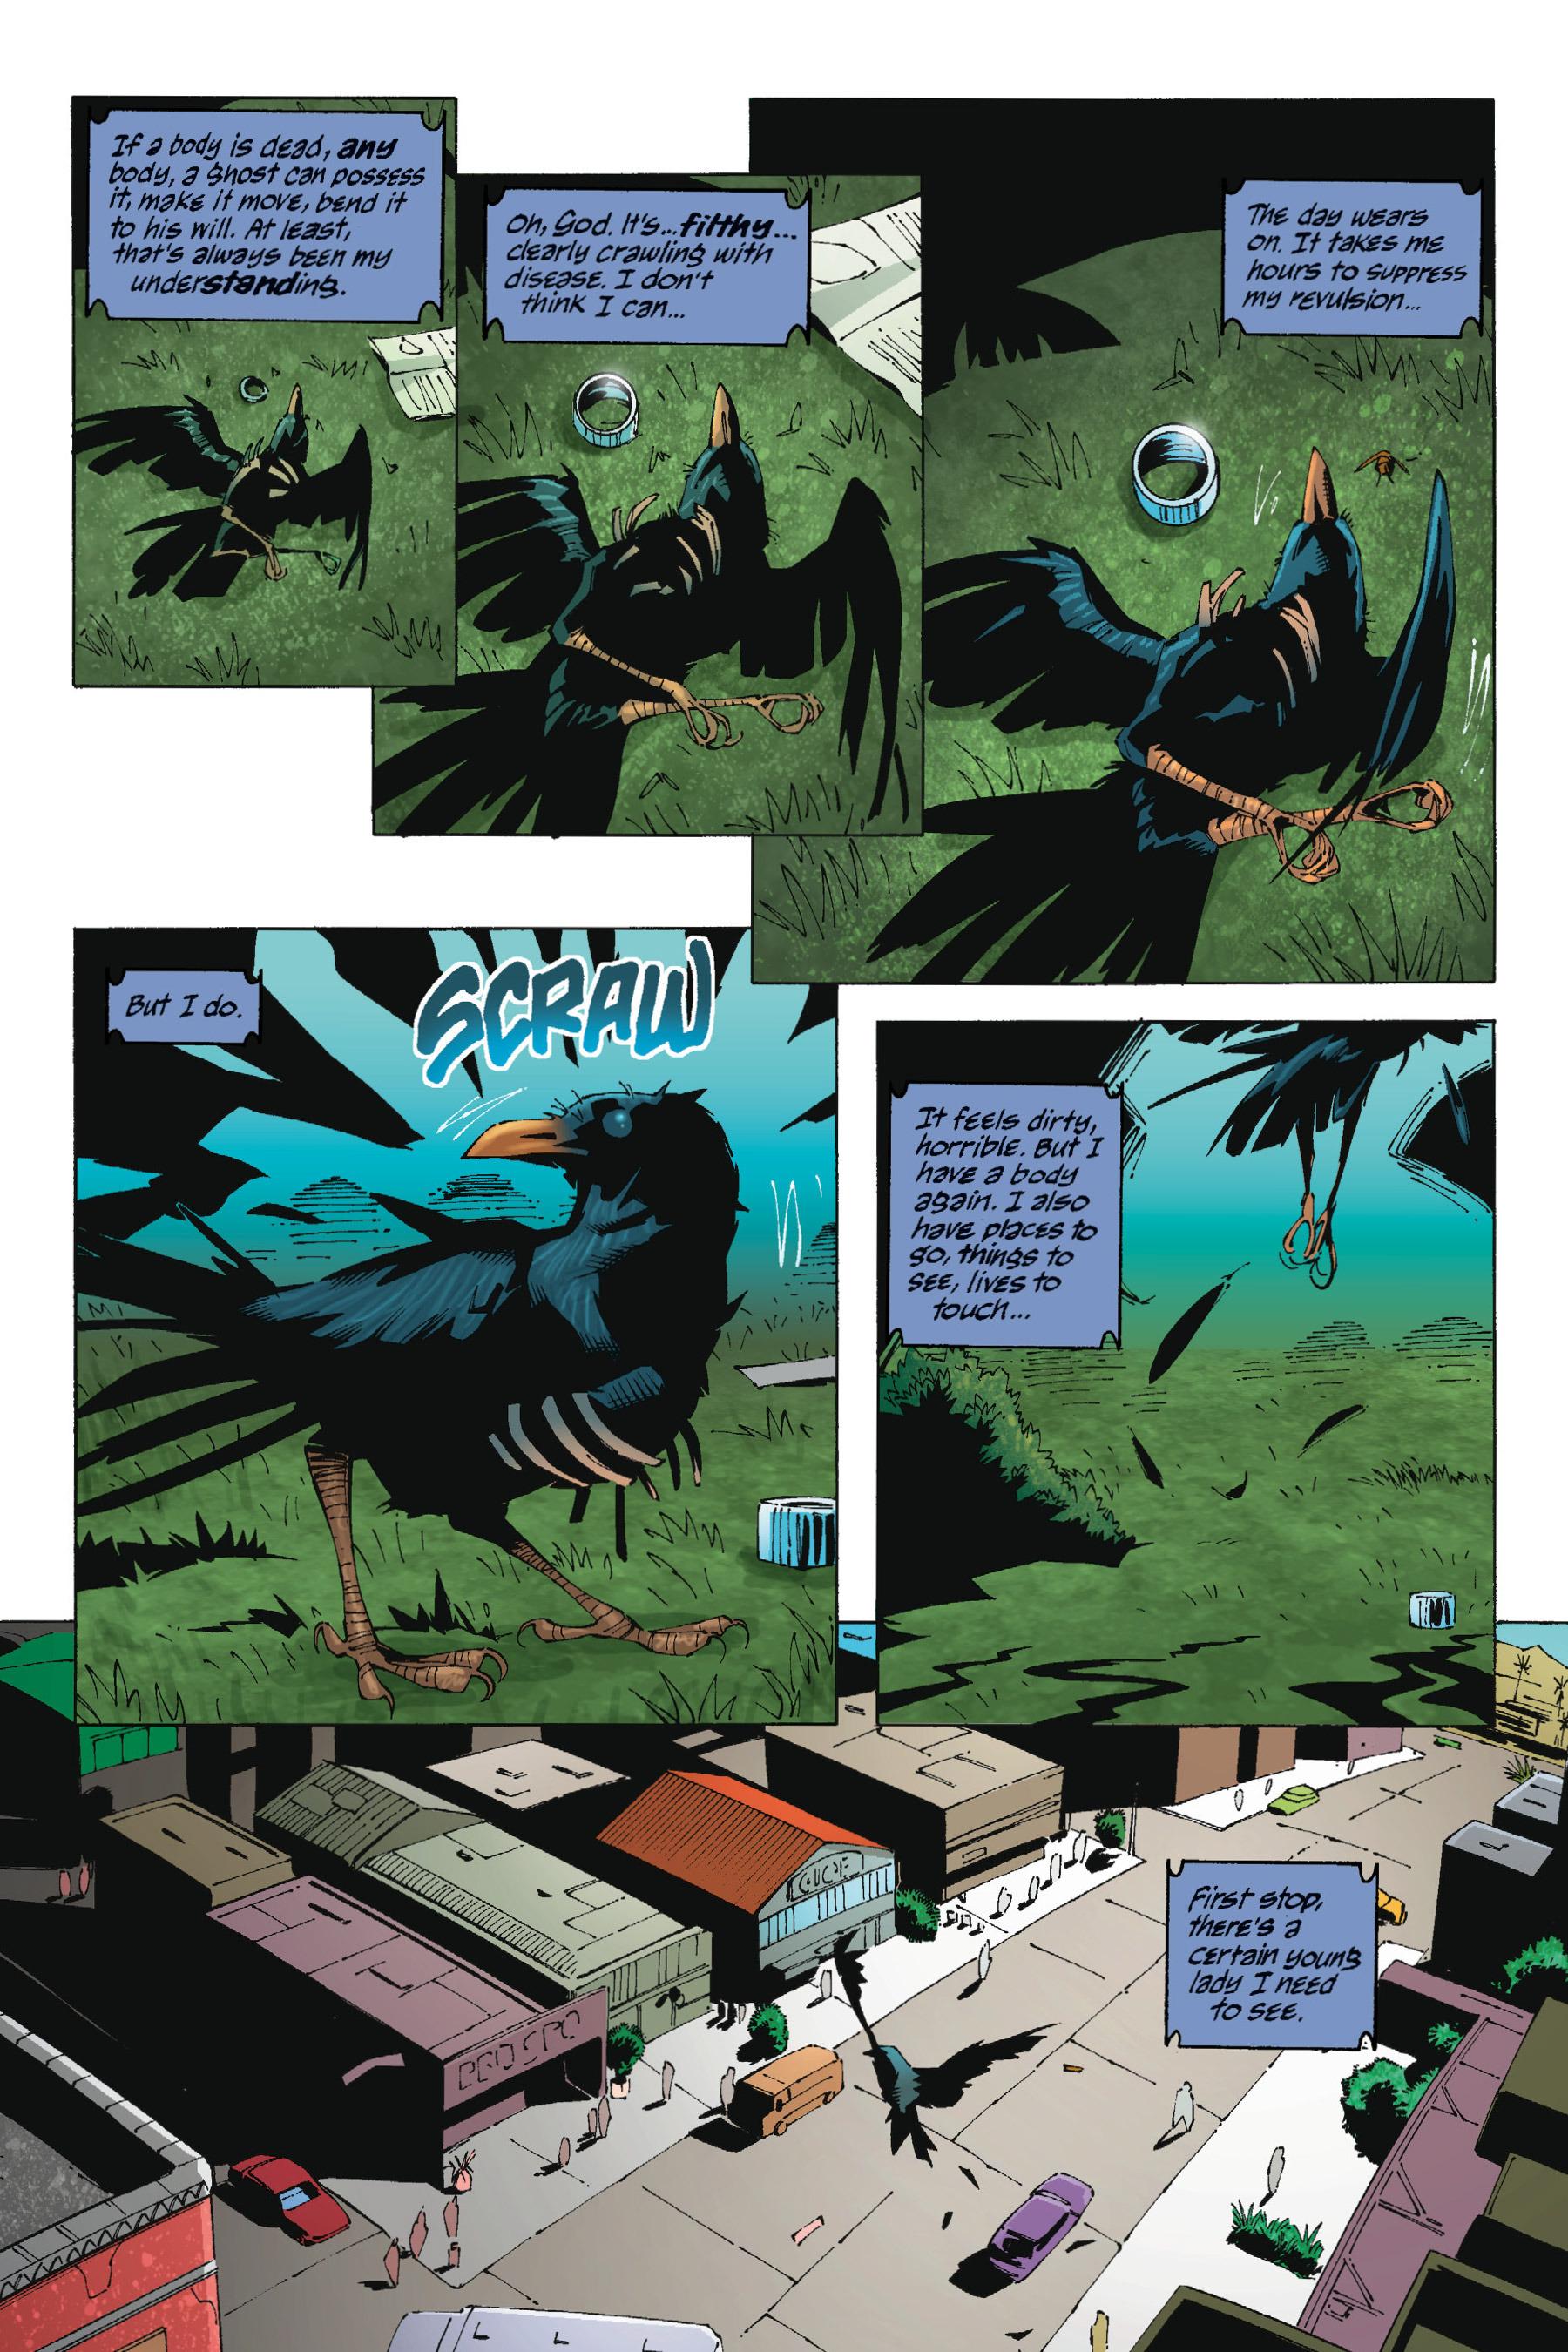 Read online Buffy the Vampire Slayer: Omnibus comic -  Issue # TPB 5 - 17